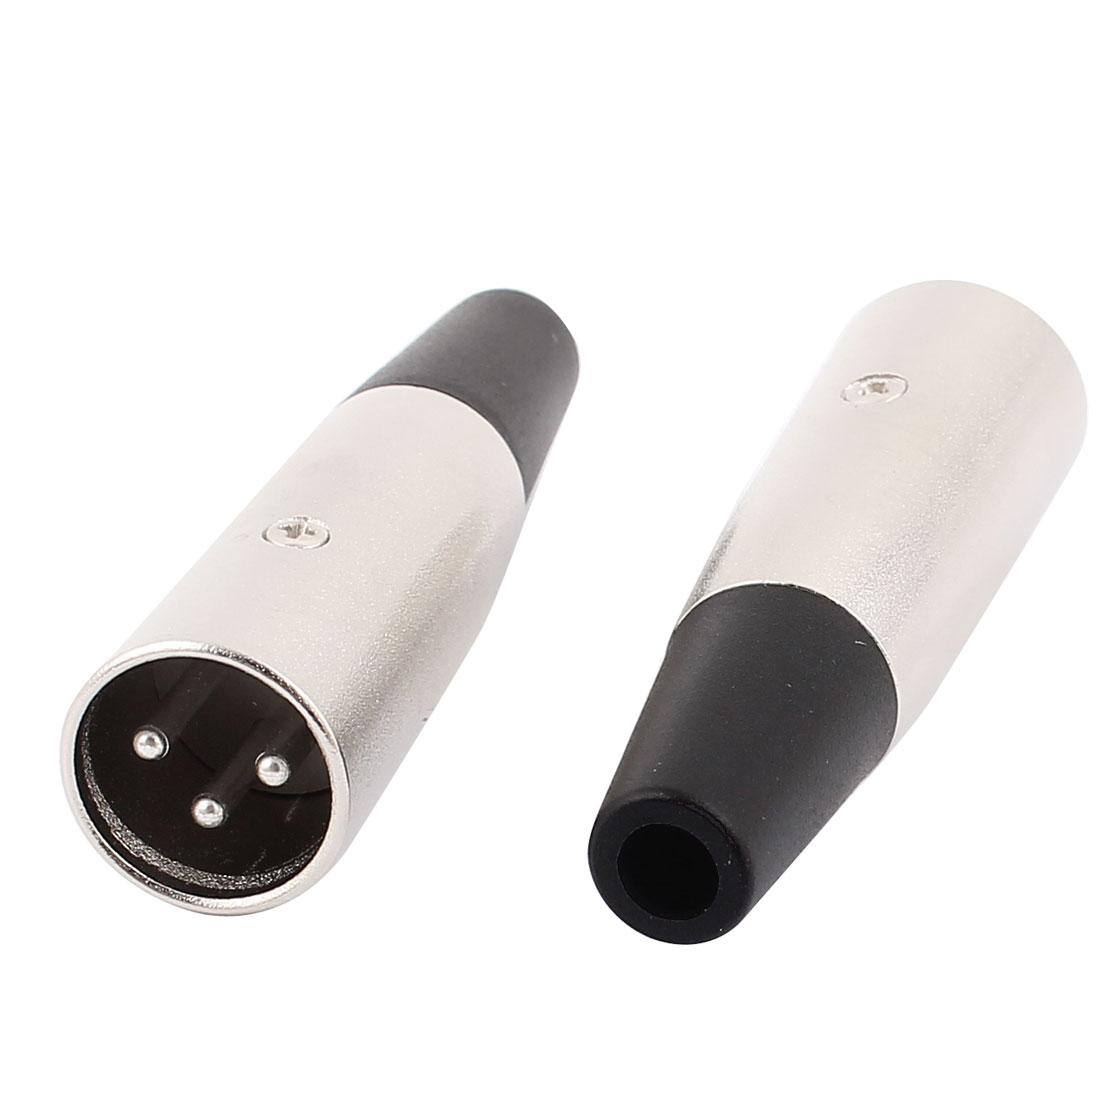 2pcs Microphone Speaker 68mm 3 Terminals XLR Male Audio Cable Connector